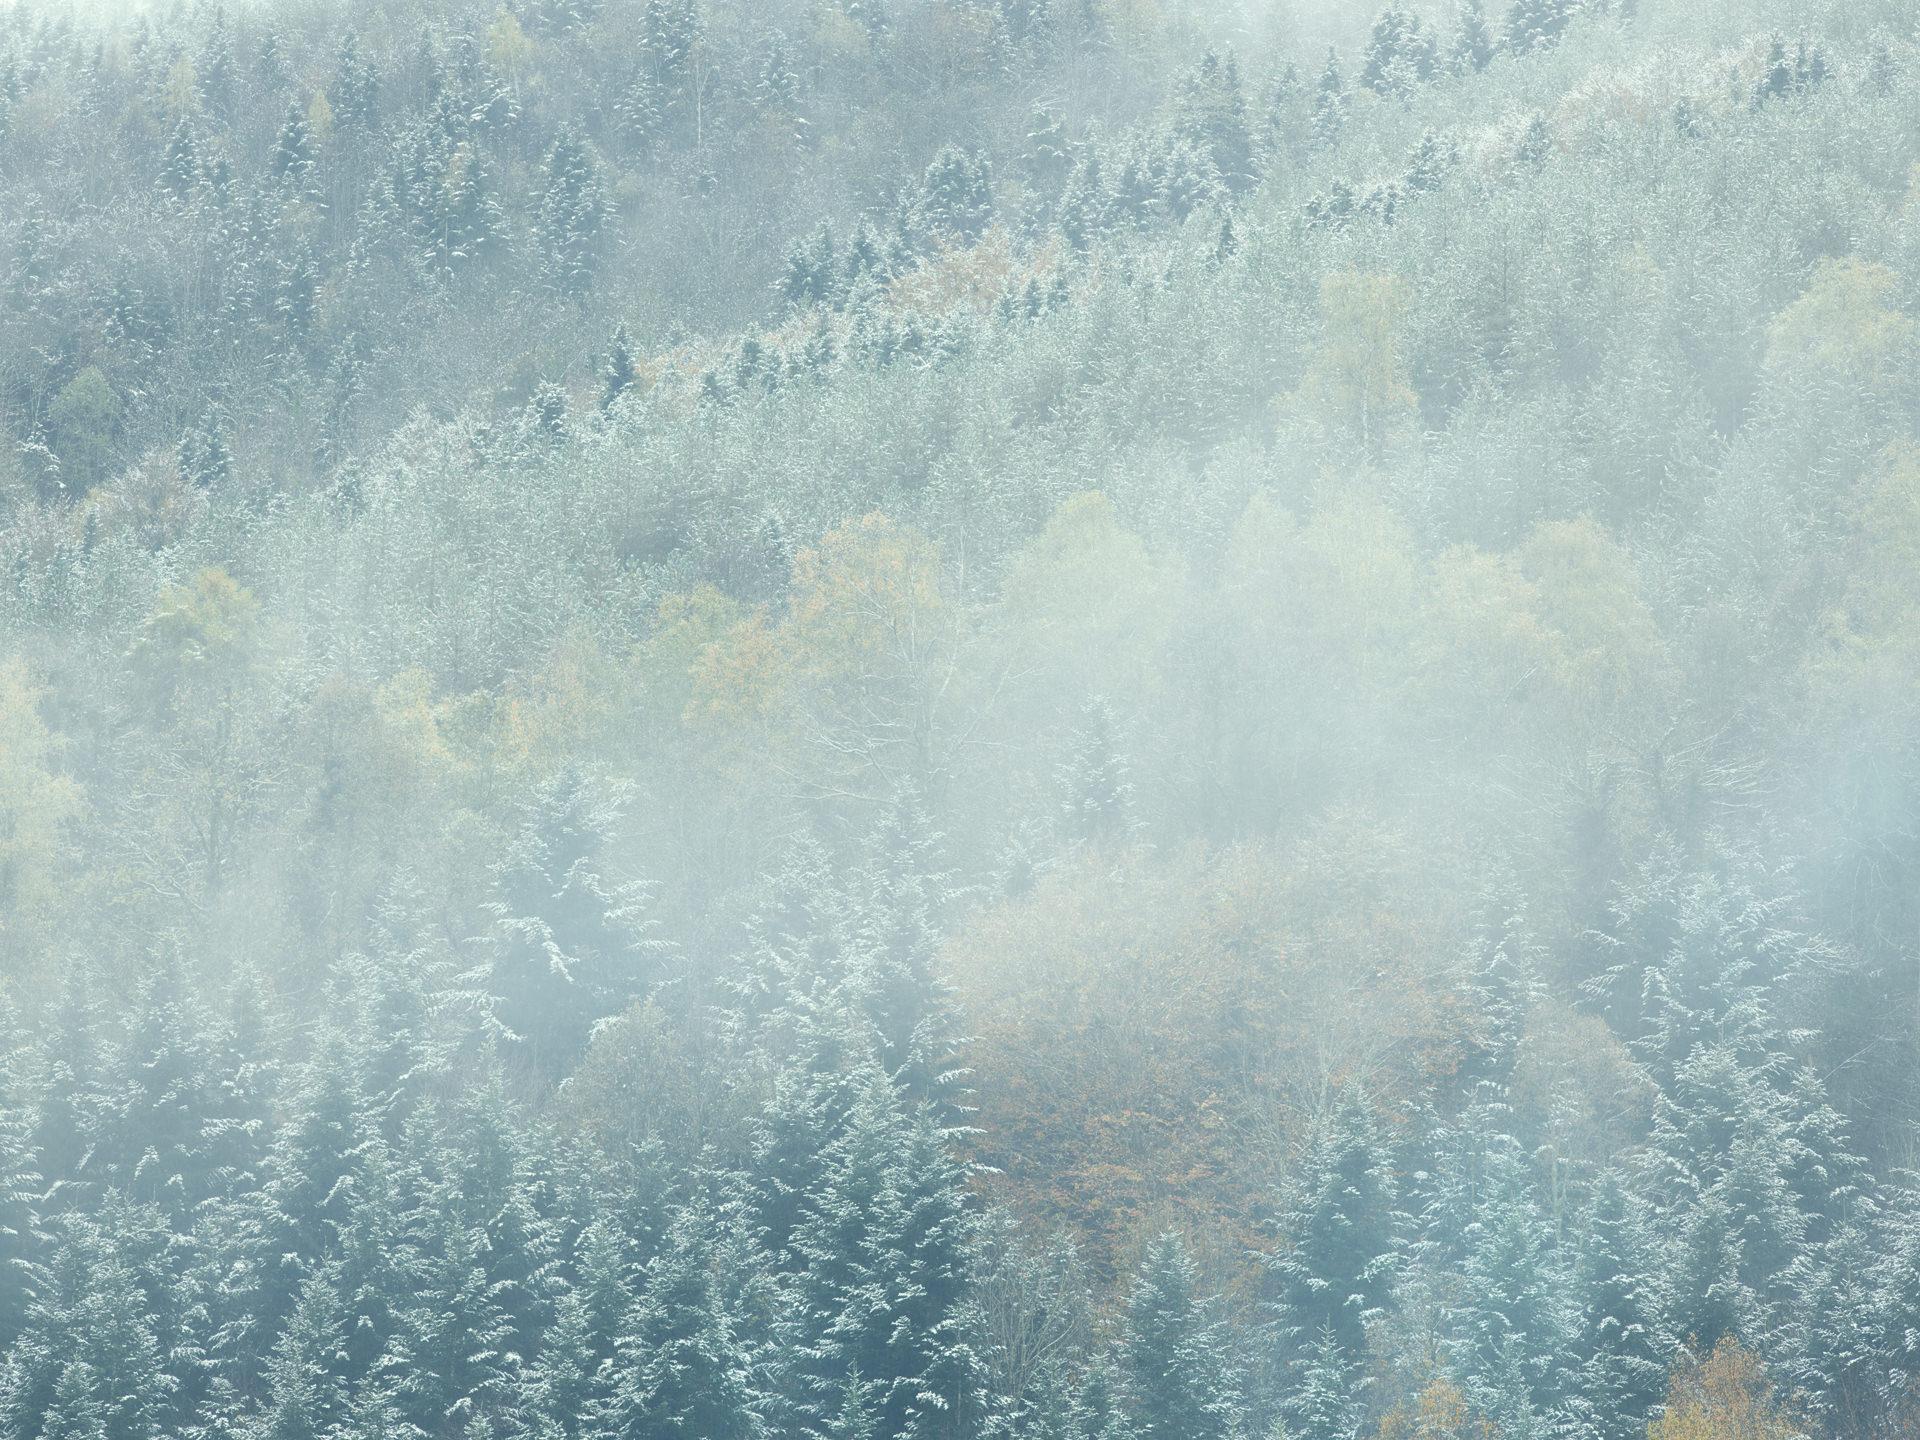 pyrenees, landscape, france, spain, anke luckmann, mountains, www.ankeluckmann.com, trees, white